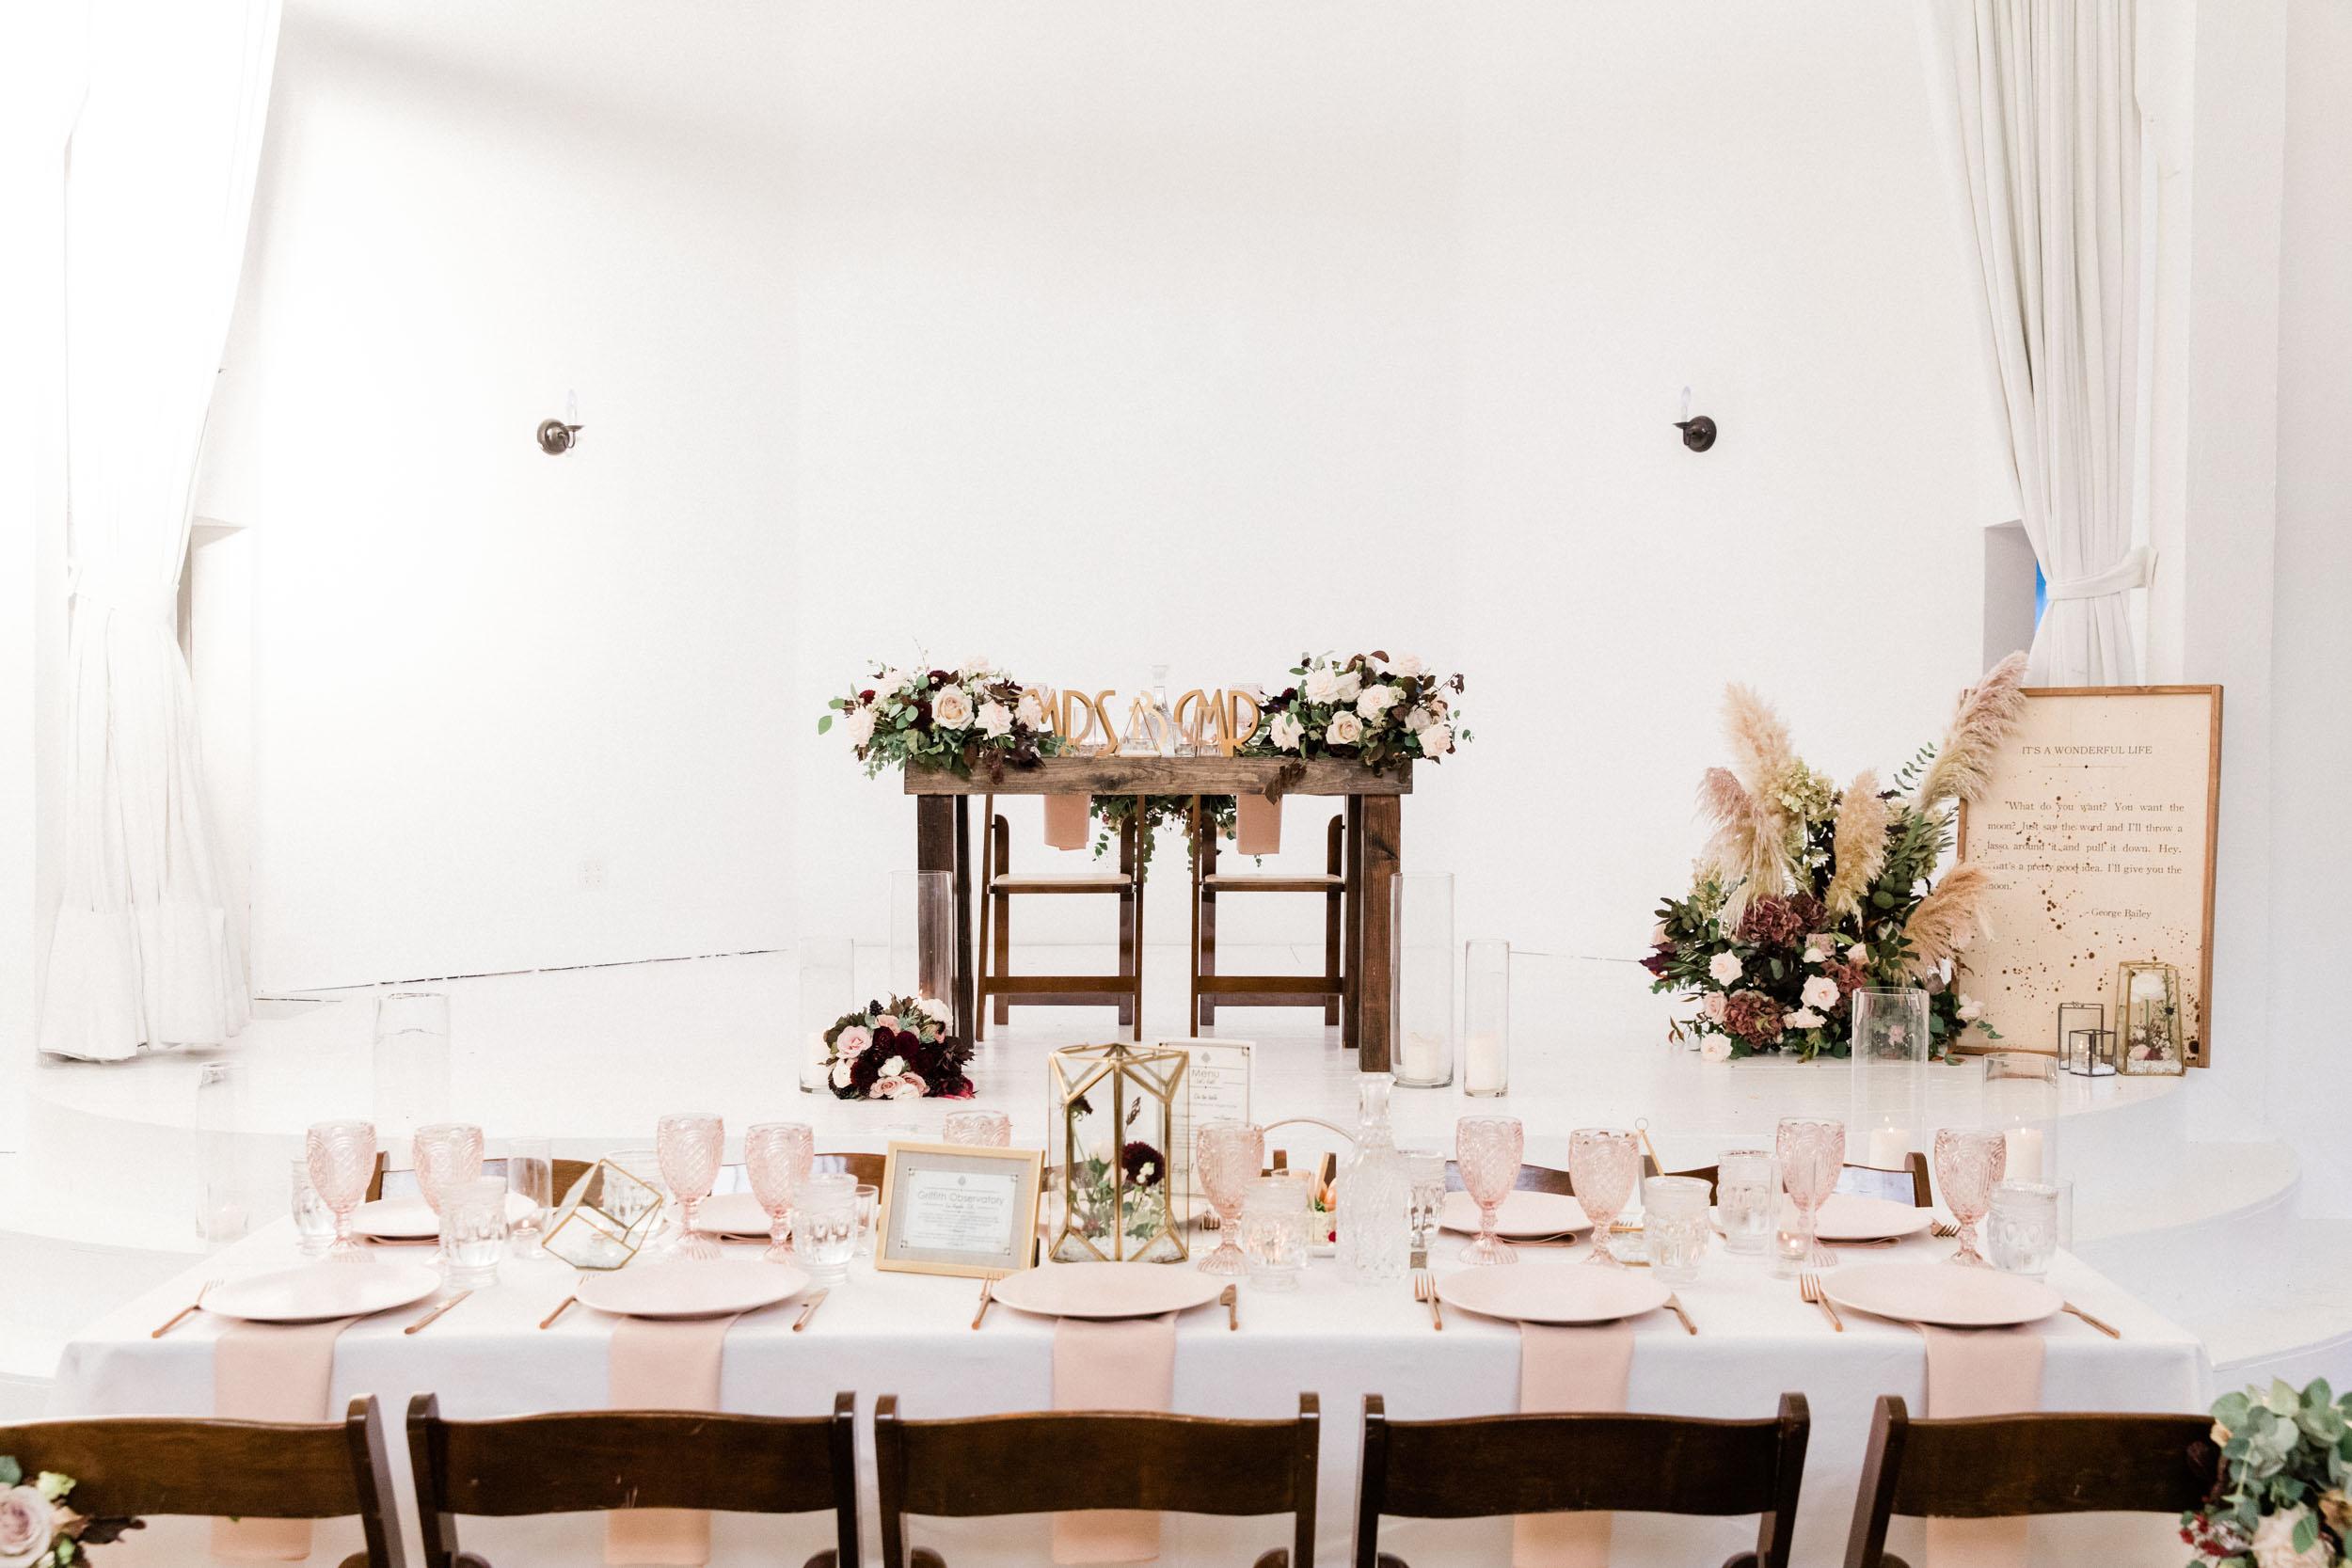 BKM-Photography-Los-Angeles-Highland-Park-York-Manor-Wedding-Photography-0913.jpg